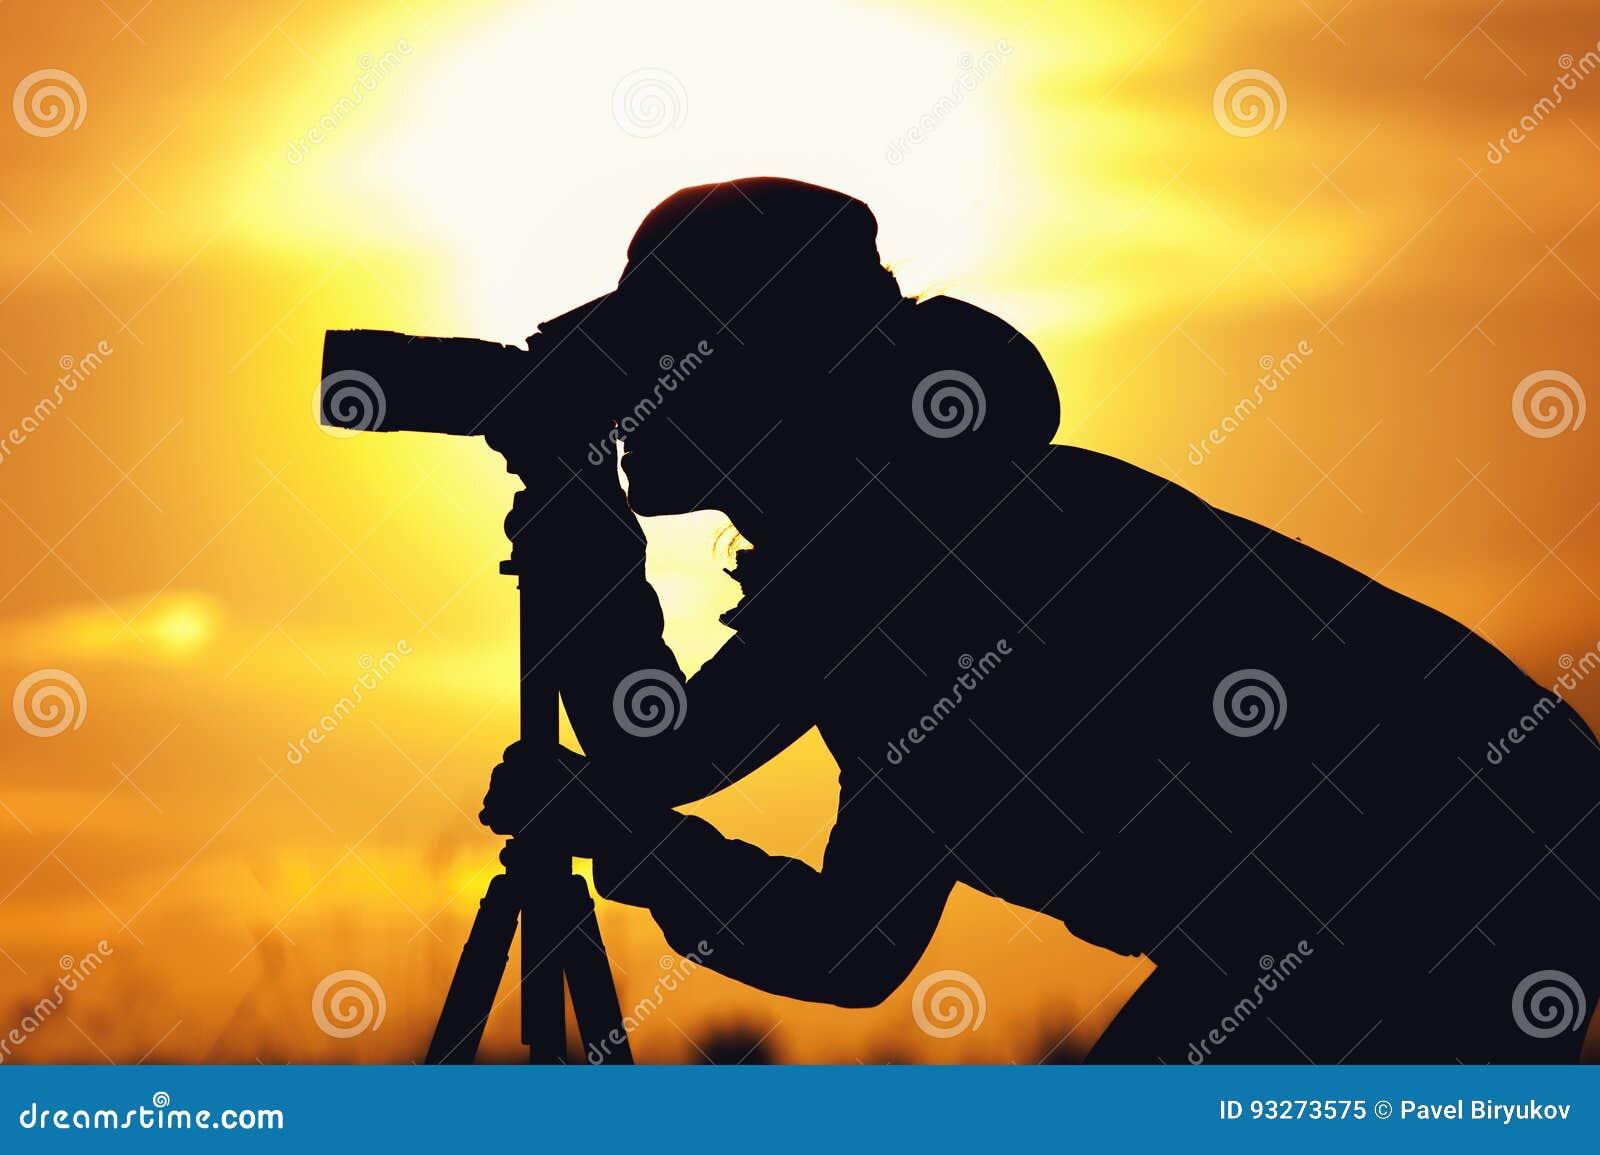 Kontur av den kvinnliga fotografen mot solnedgång